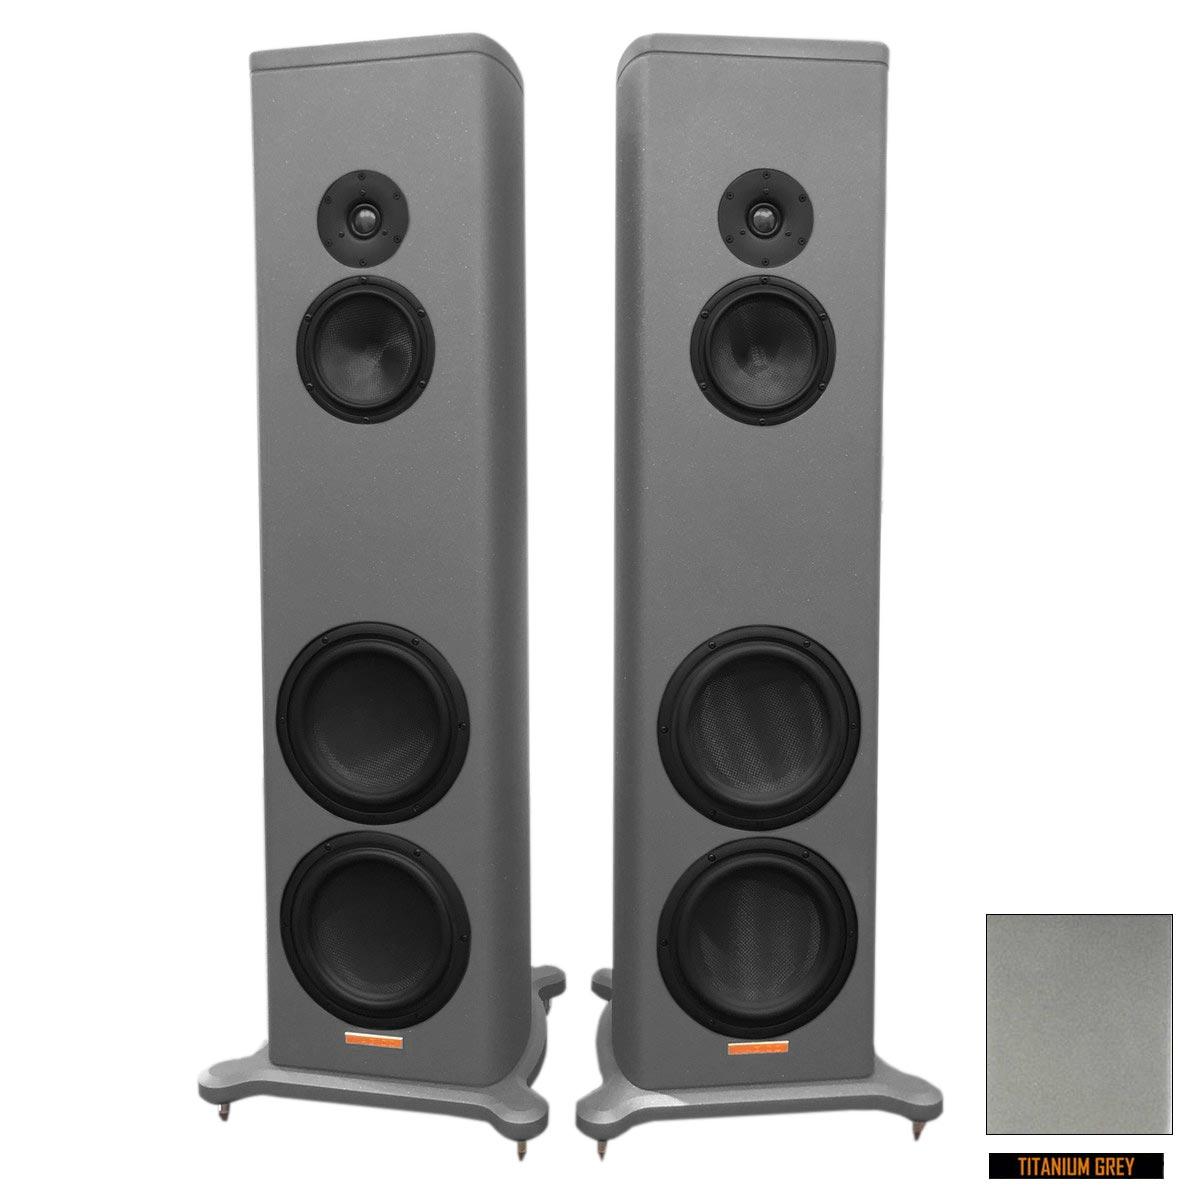 Напольная акустика Magico S3 MkII M-COAT titanium grey